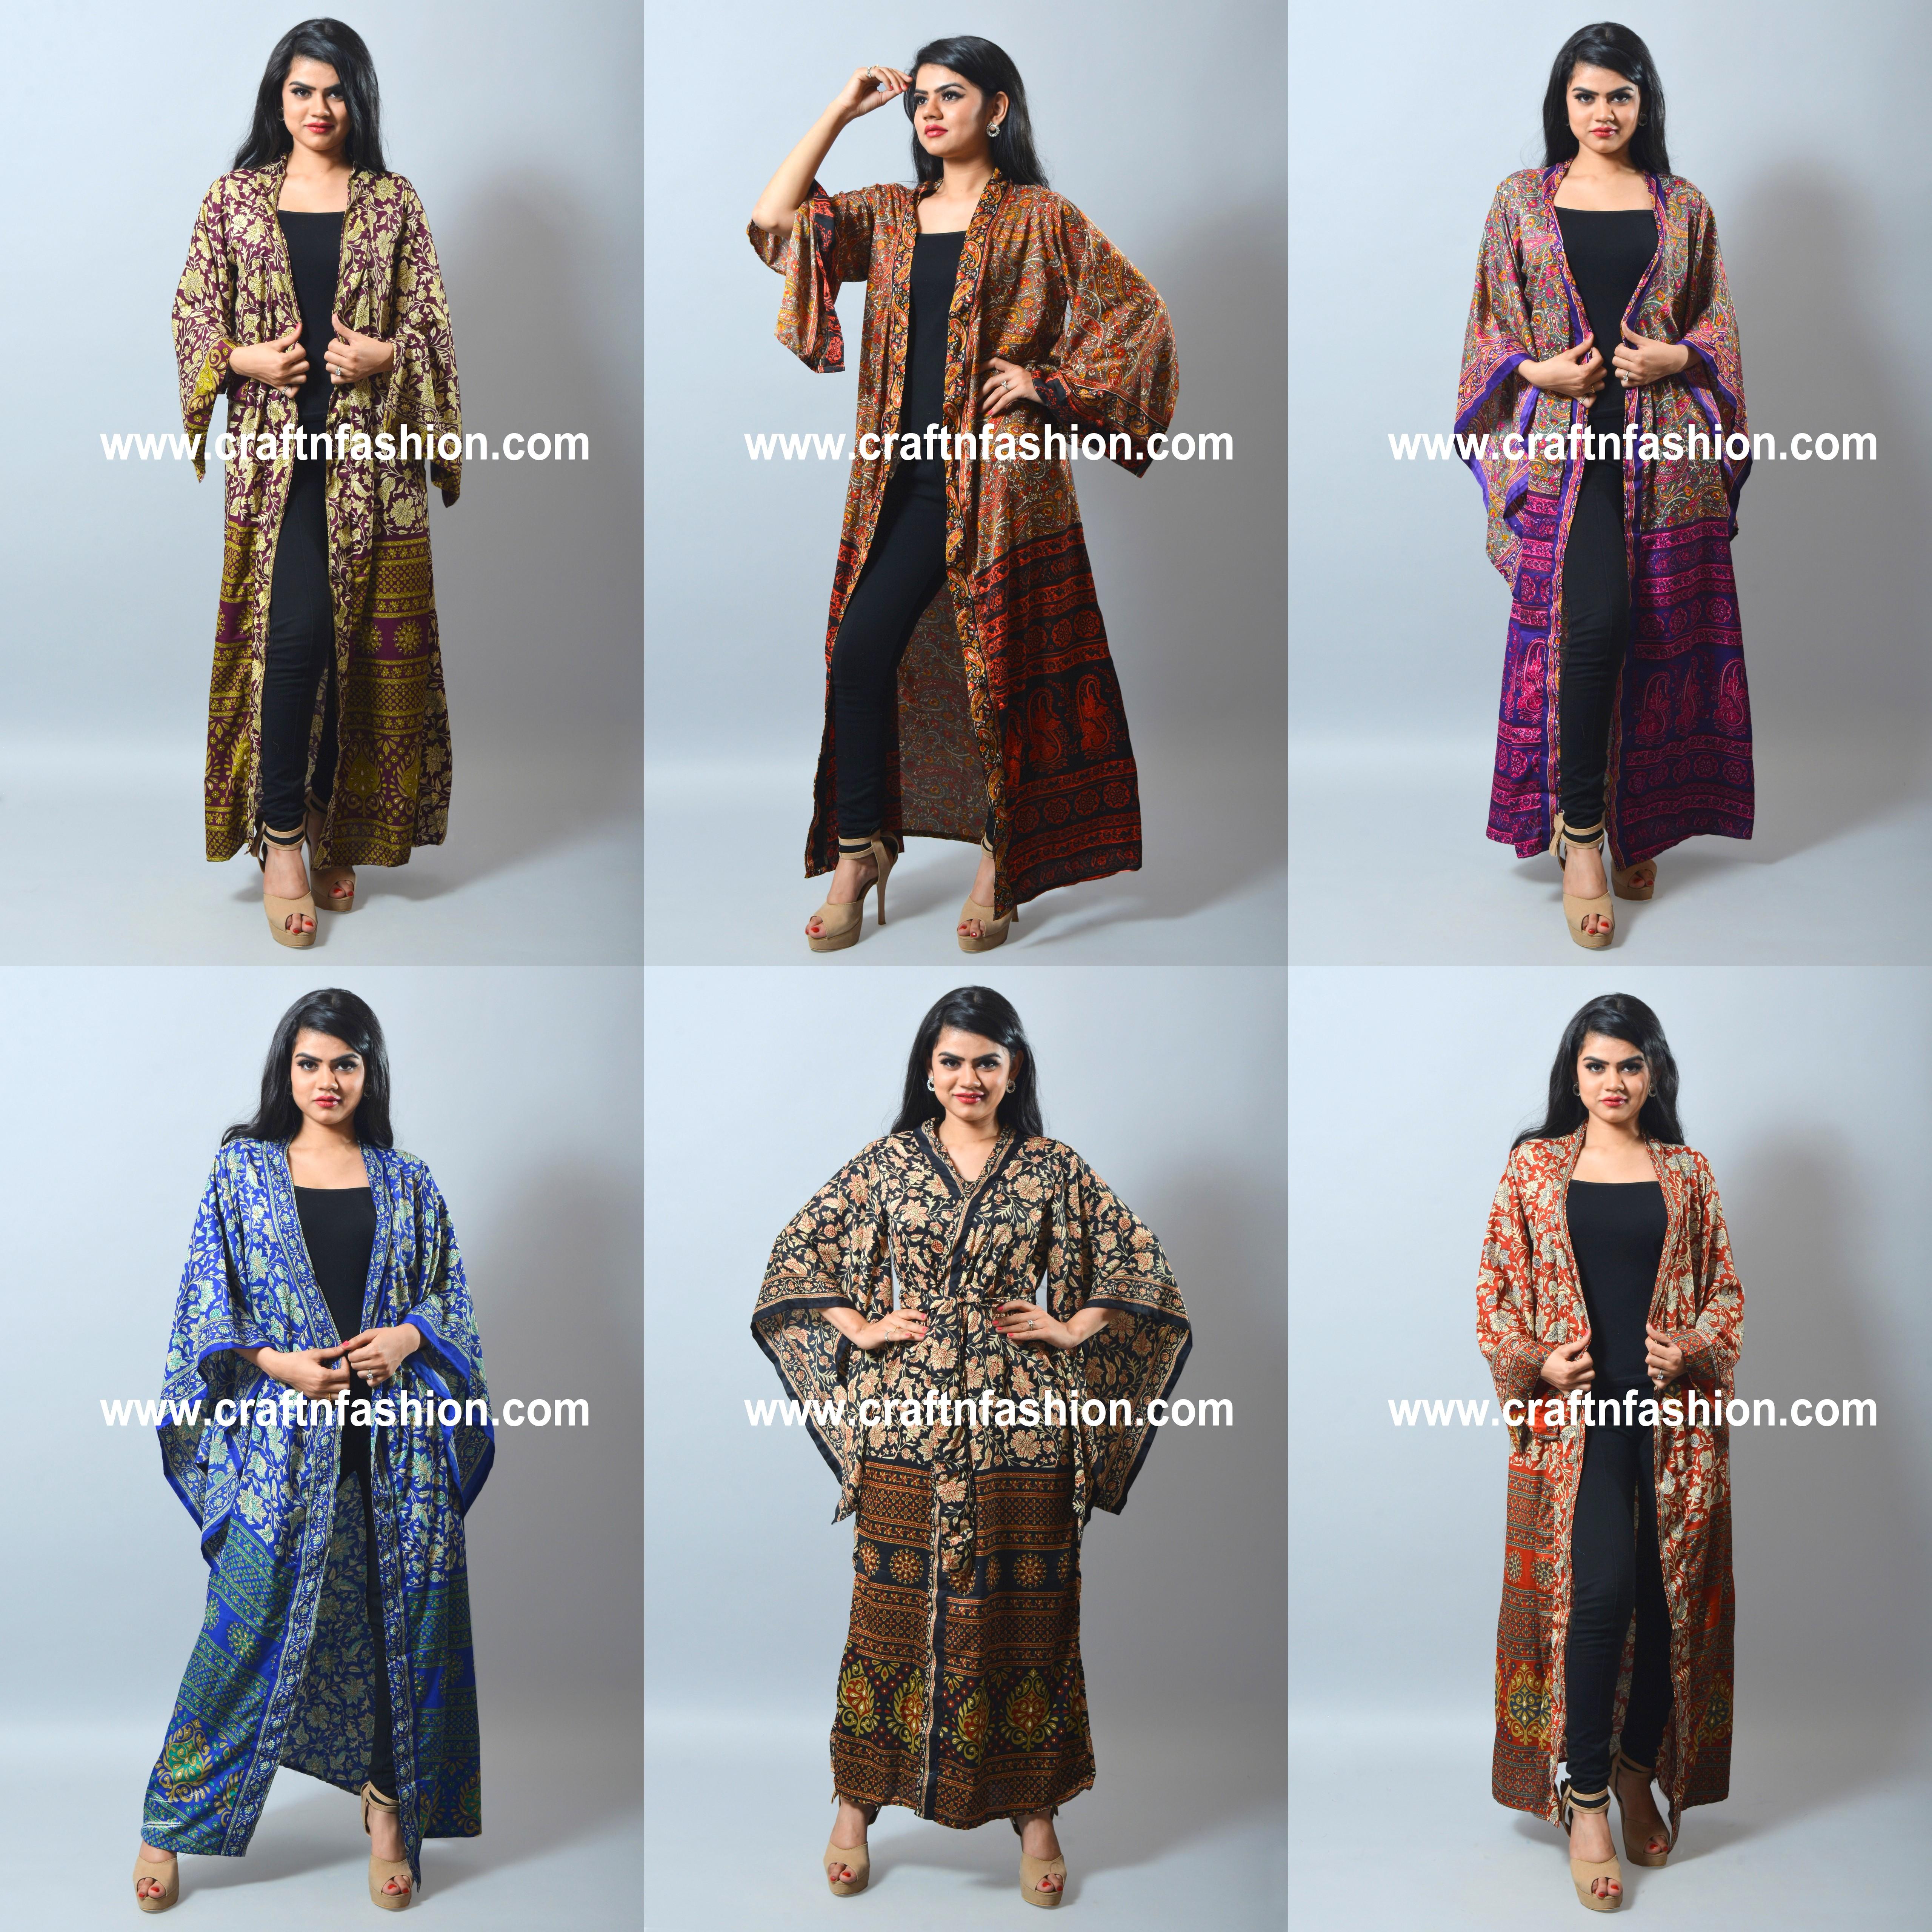 Silk Vintage Robes Kimono Stylish Fashionble Women Long Kimono Handmade Kimono Summer Beach Party Dress